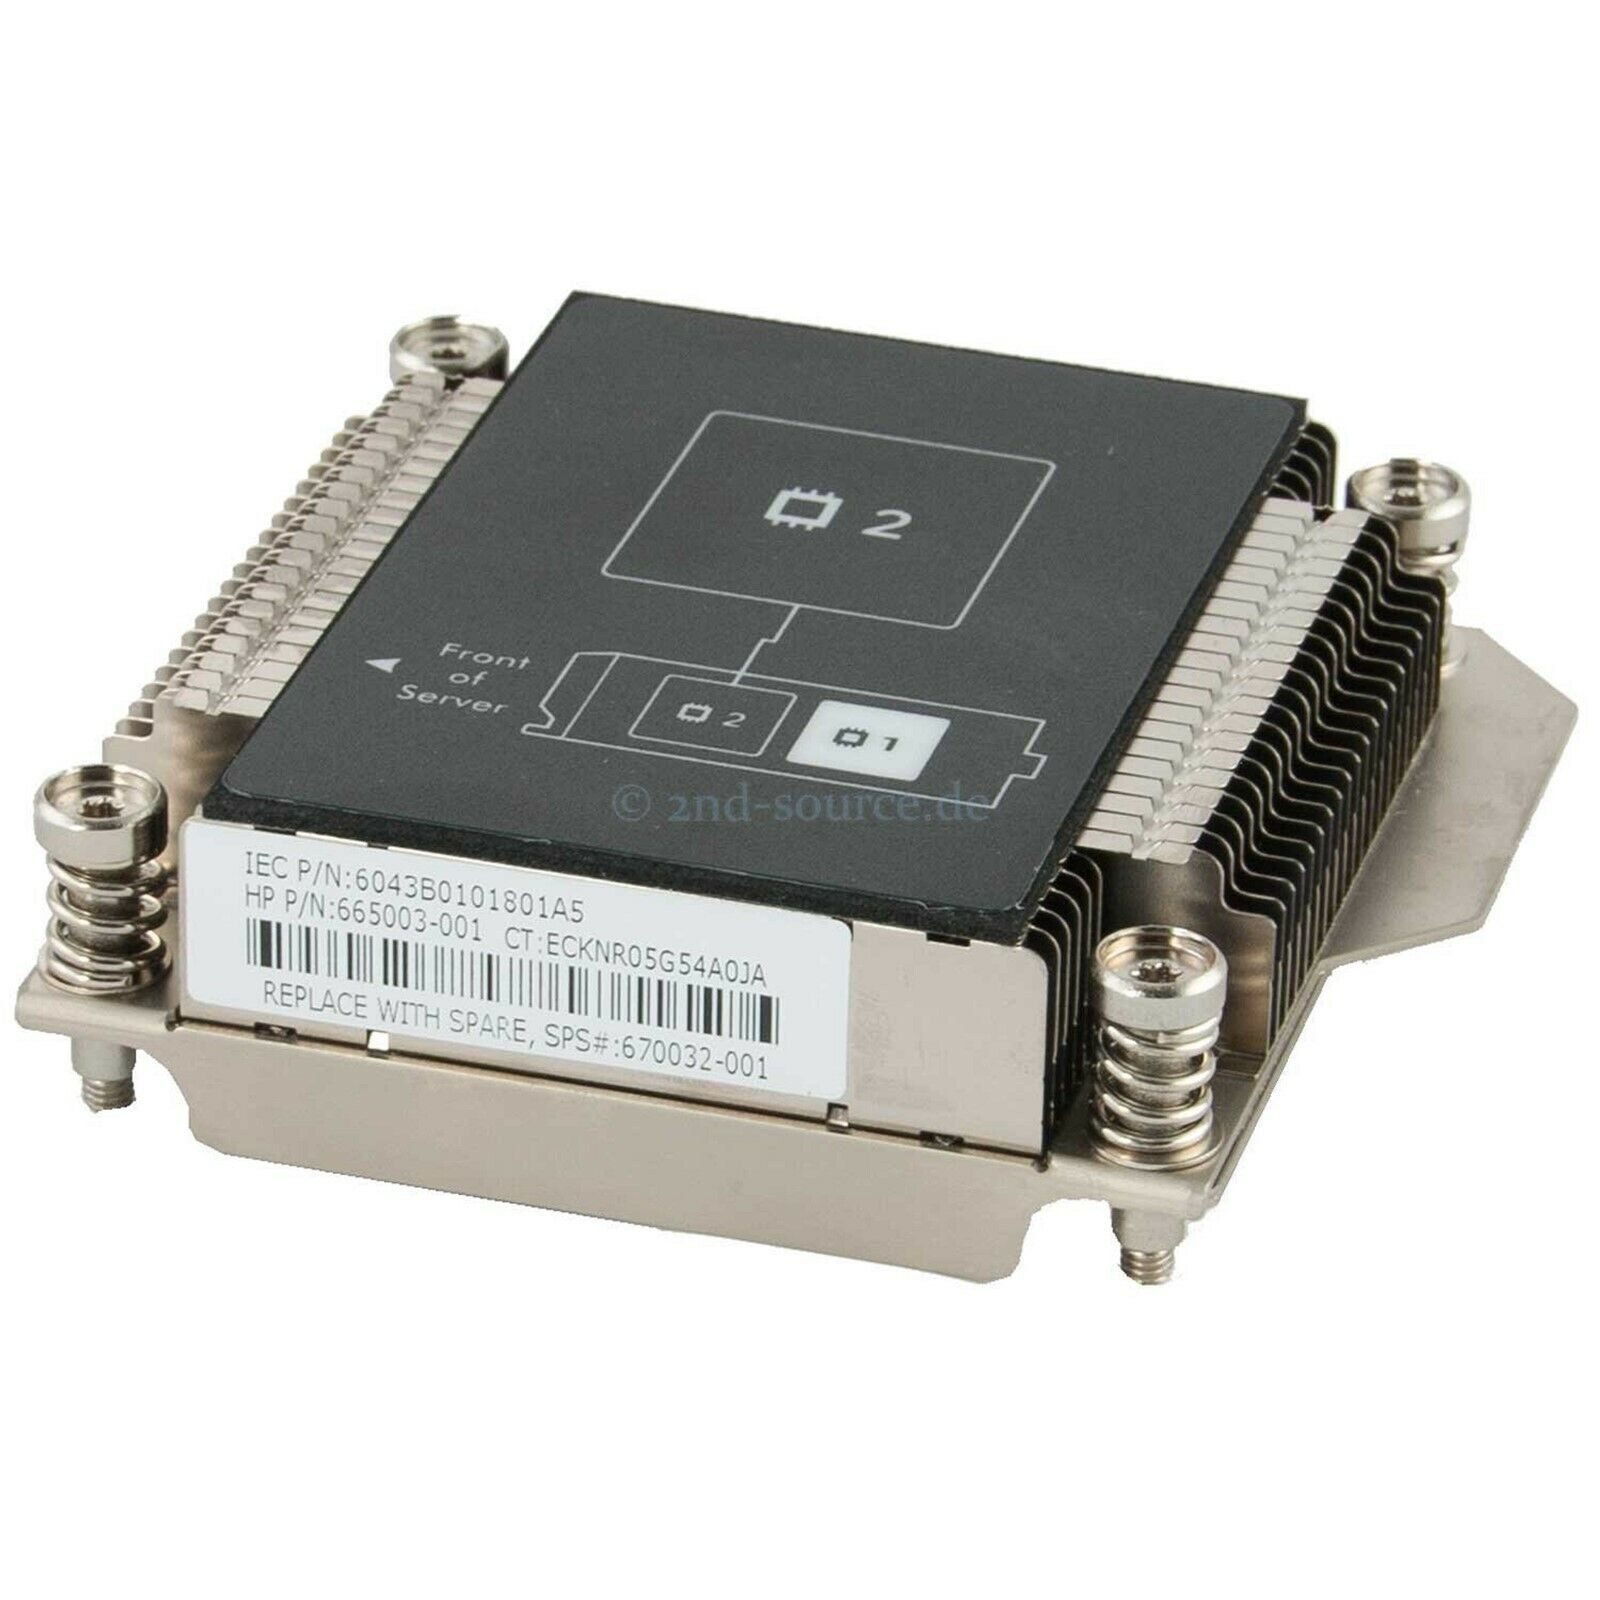 HP 762711-001 CPU 2 Heatsink for Proliant BL460c G8 WS460c G8 665003-005